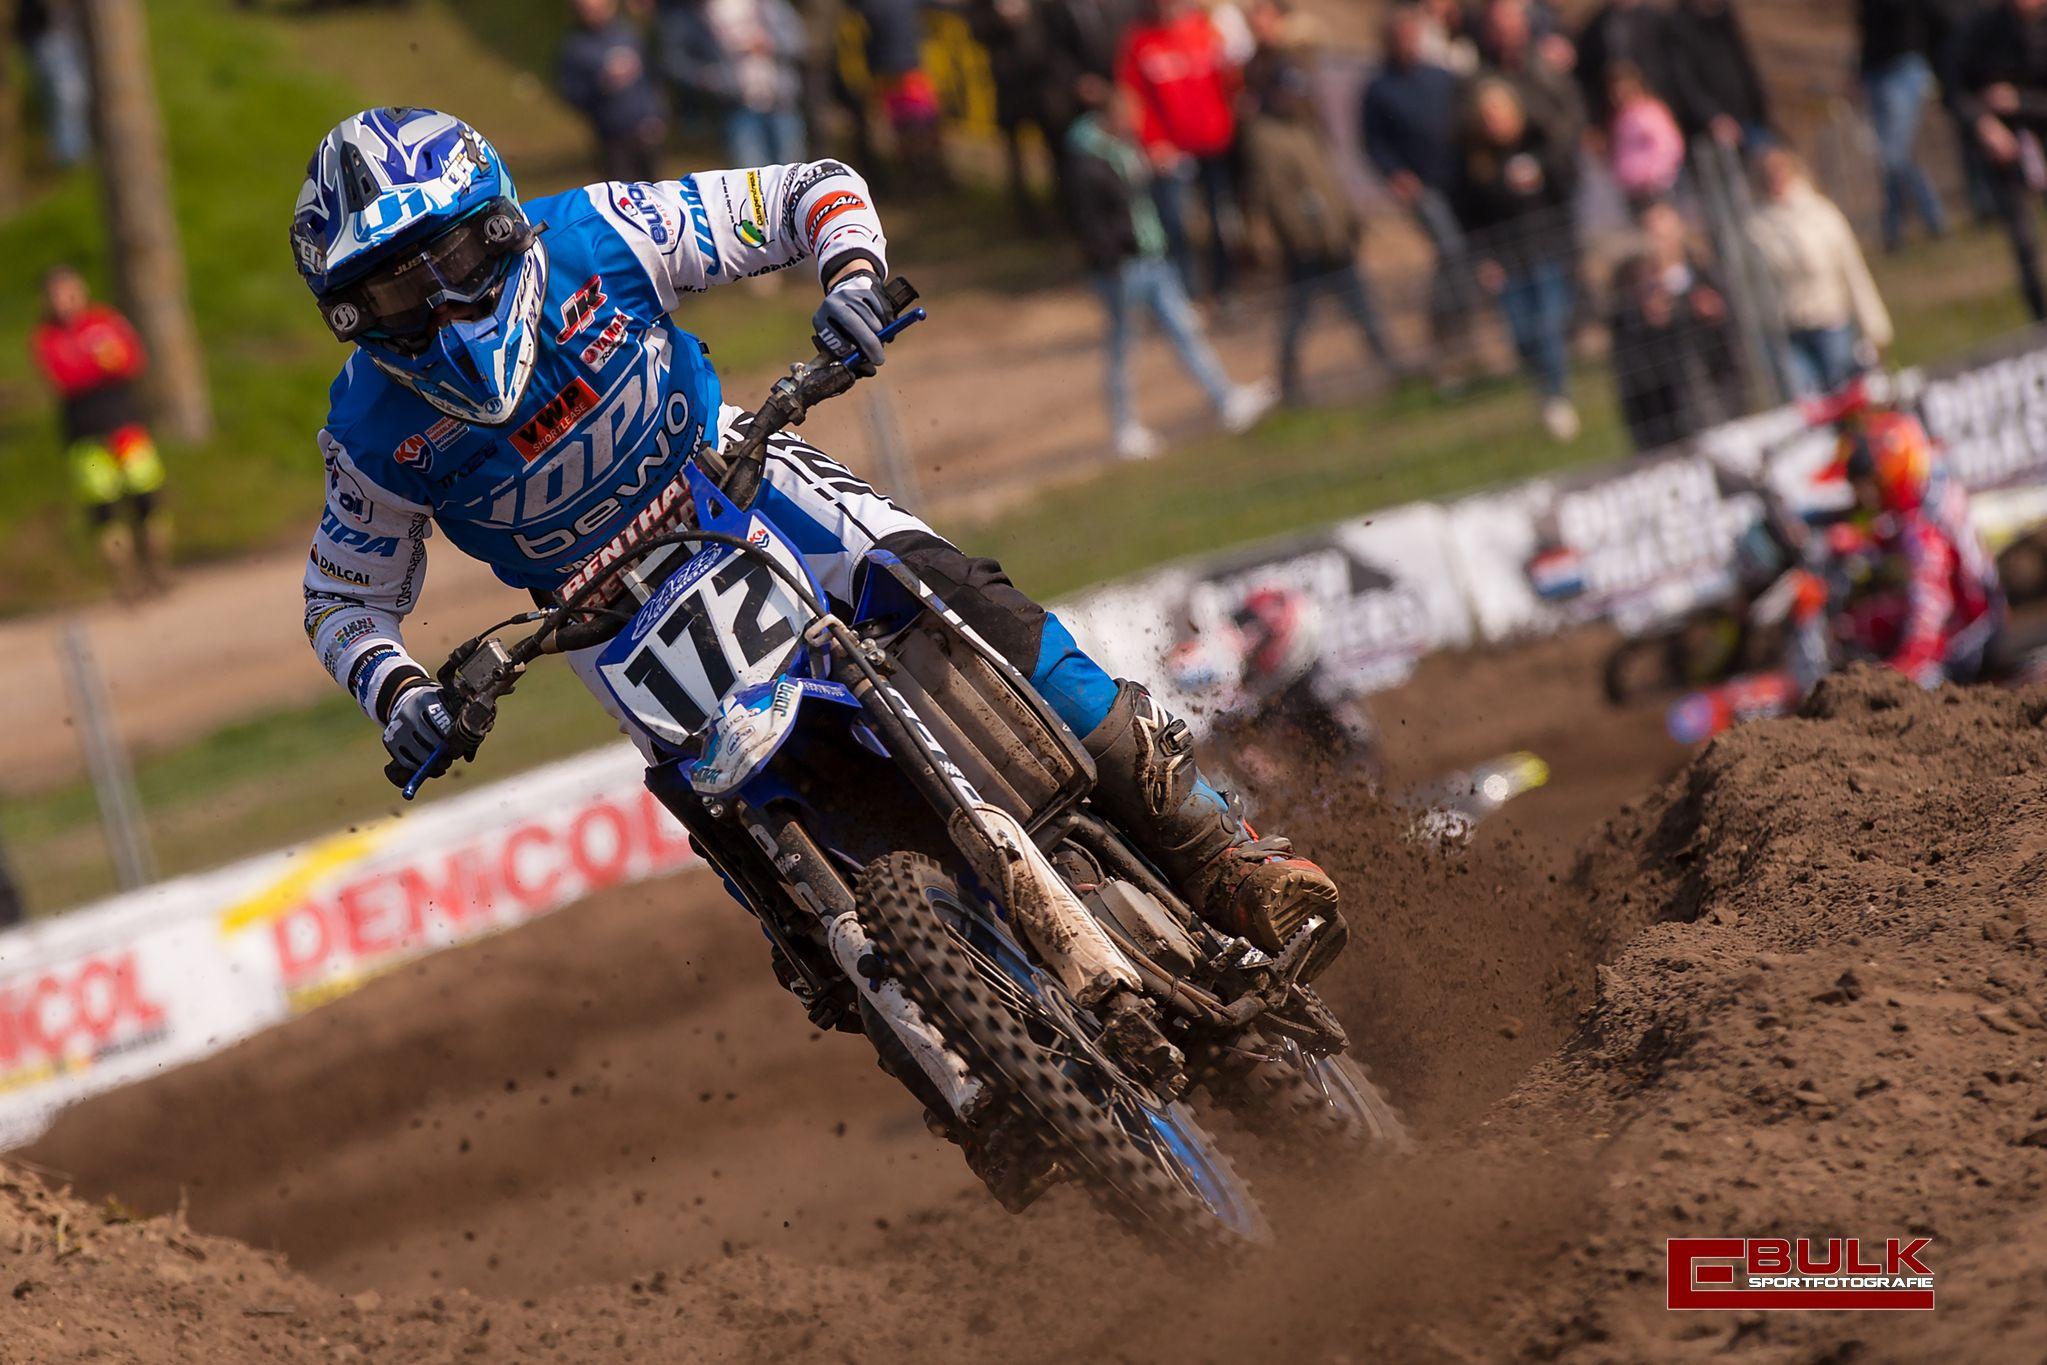 ebs_0176-ed_bulk_sportfotografie